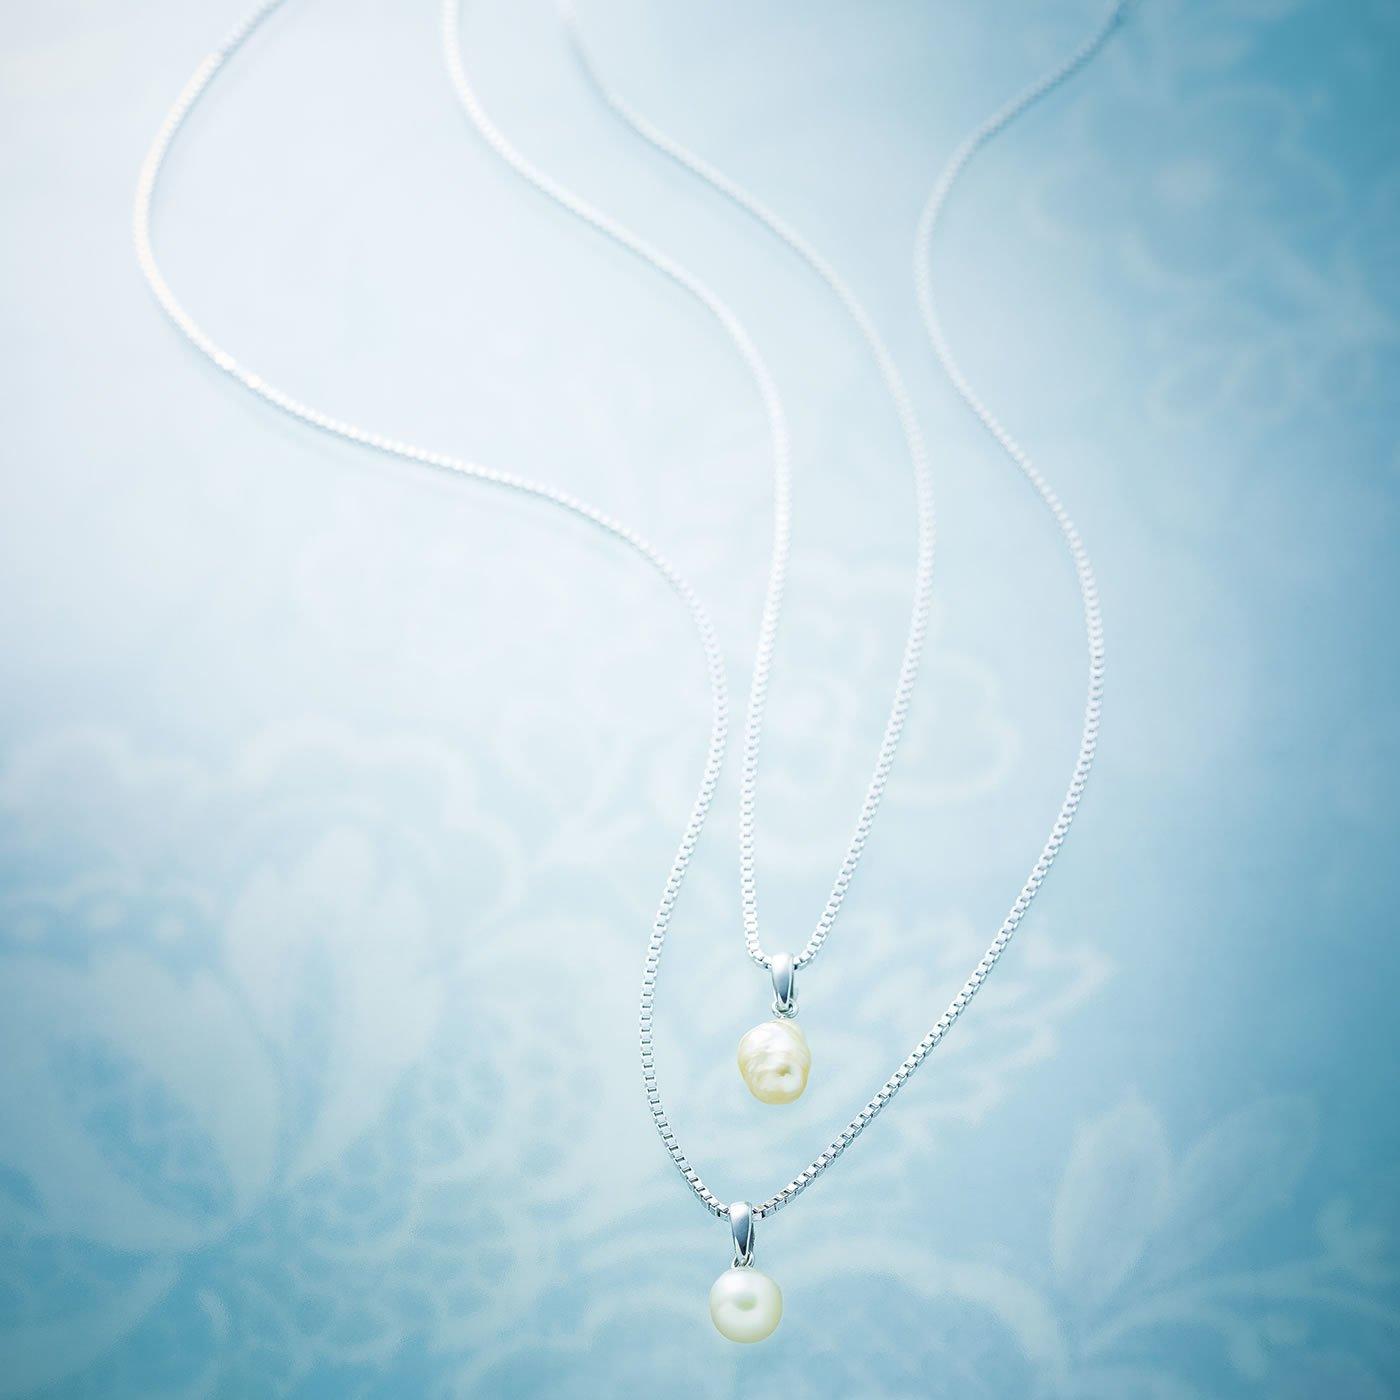 LX 大人の新定番 パールの魅力と希少感で大人チャレンジ! 白蝶貝が育てたKESHI(芥子)トップ&シルバーネックレス